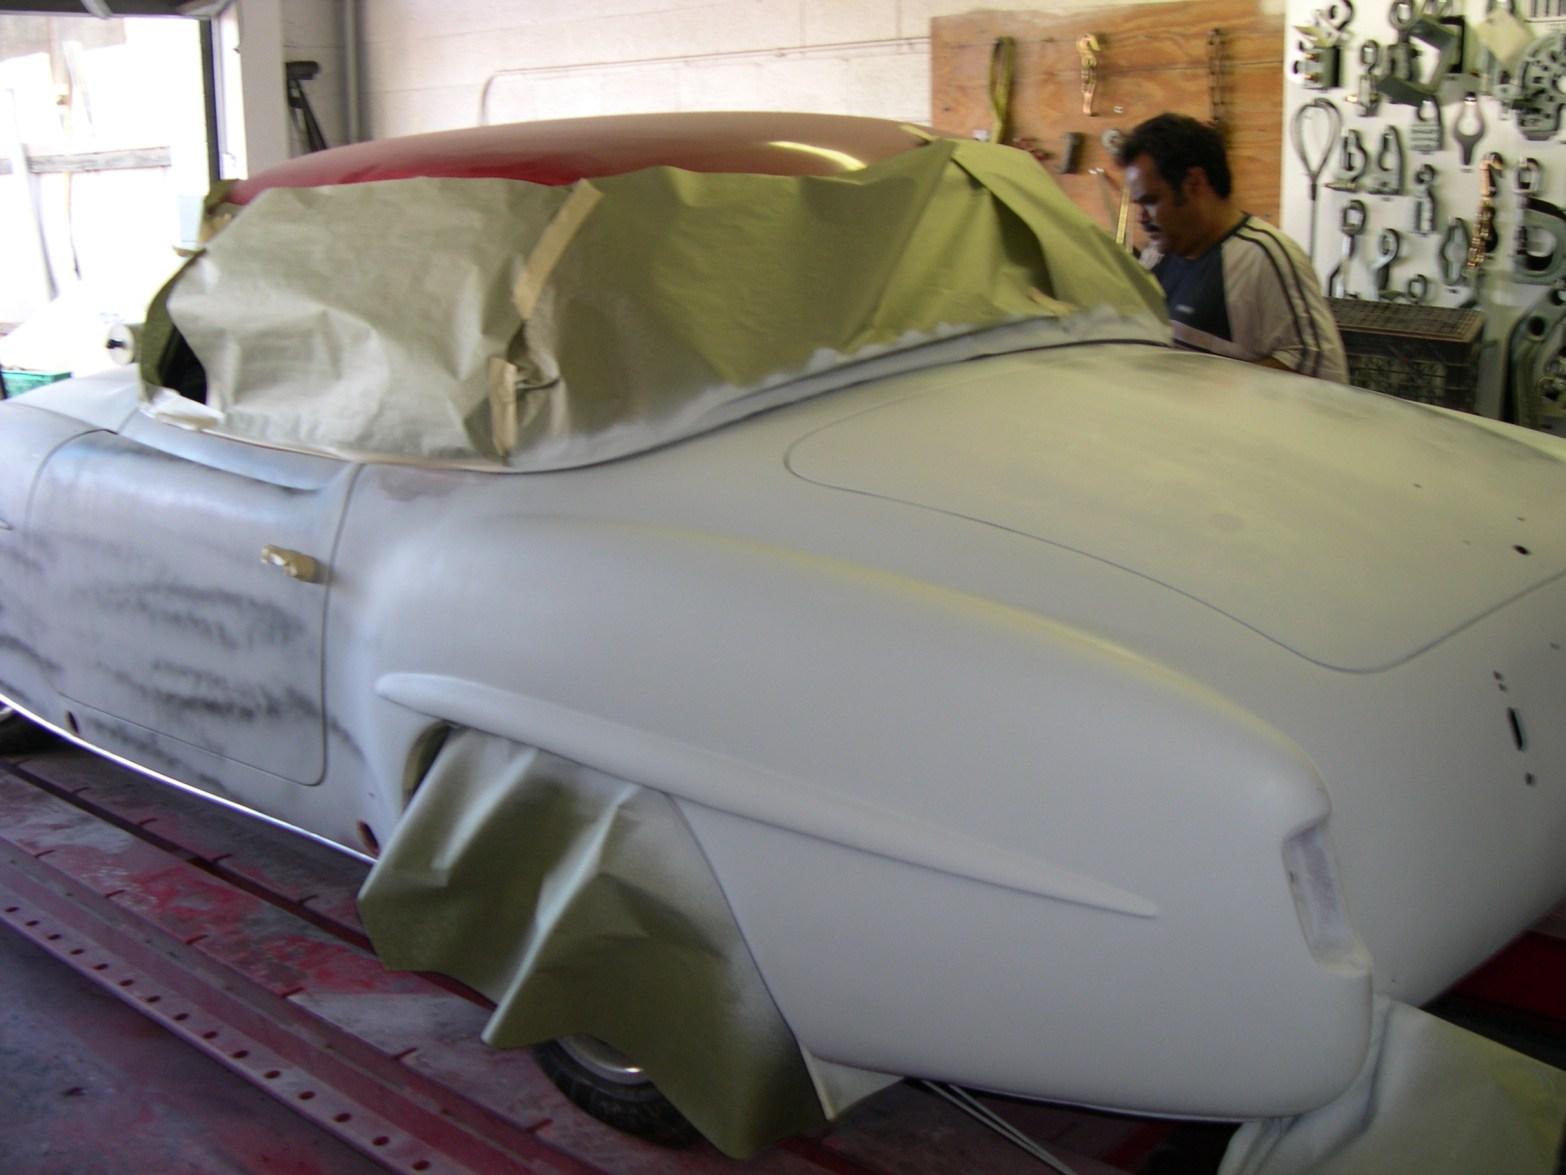 west-coast-body-and-paint-mercedes-benz-190e-10